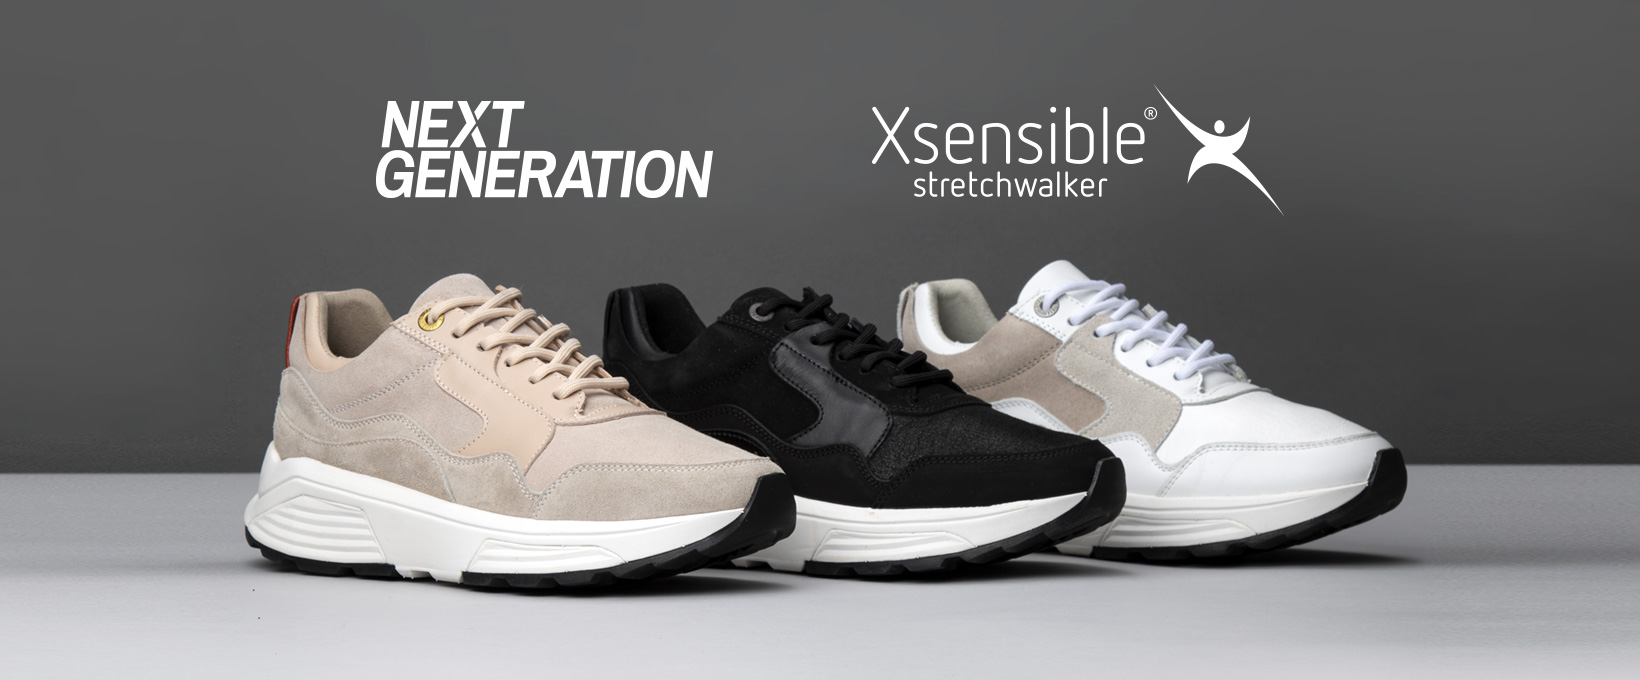 Xsensible Next Generation